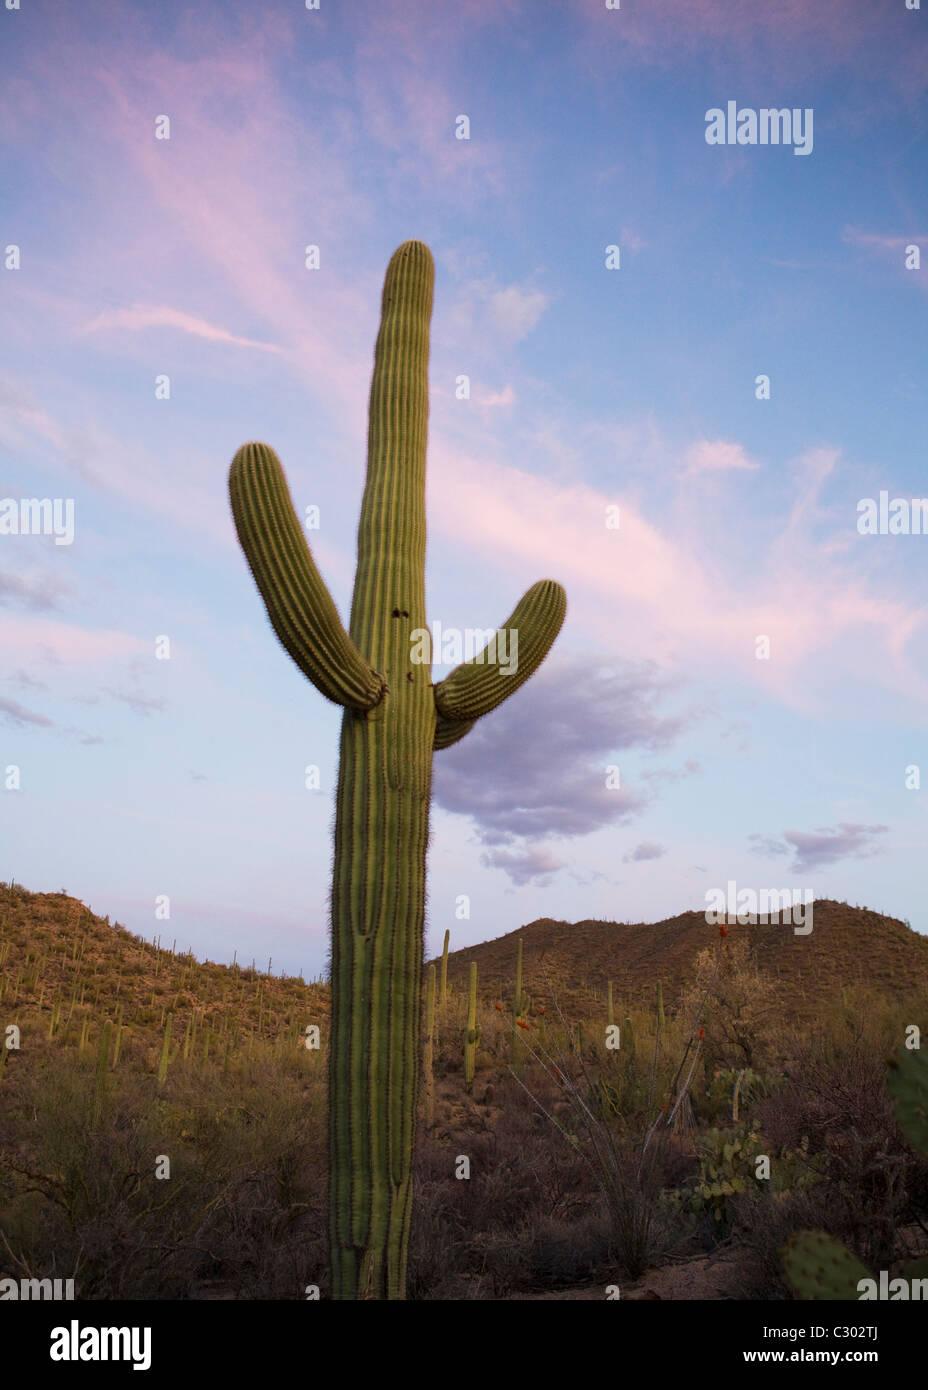 Saguaro cactus field - Saguaro National Park, Arizona USA - Stock Image